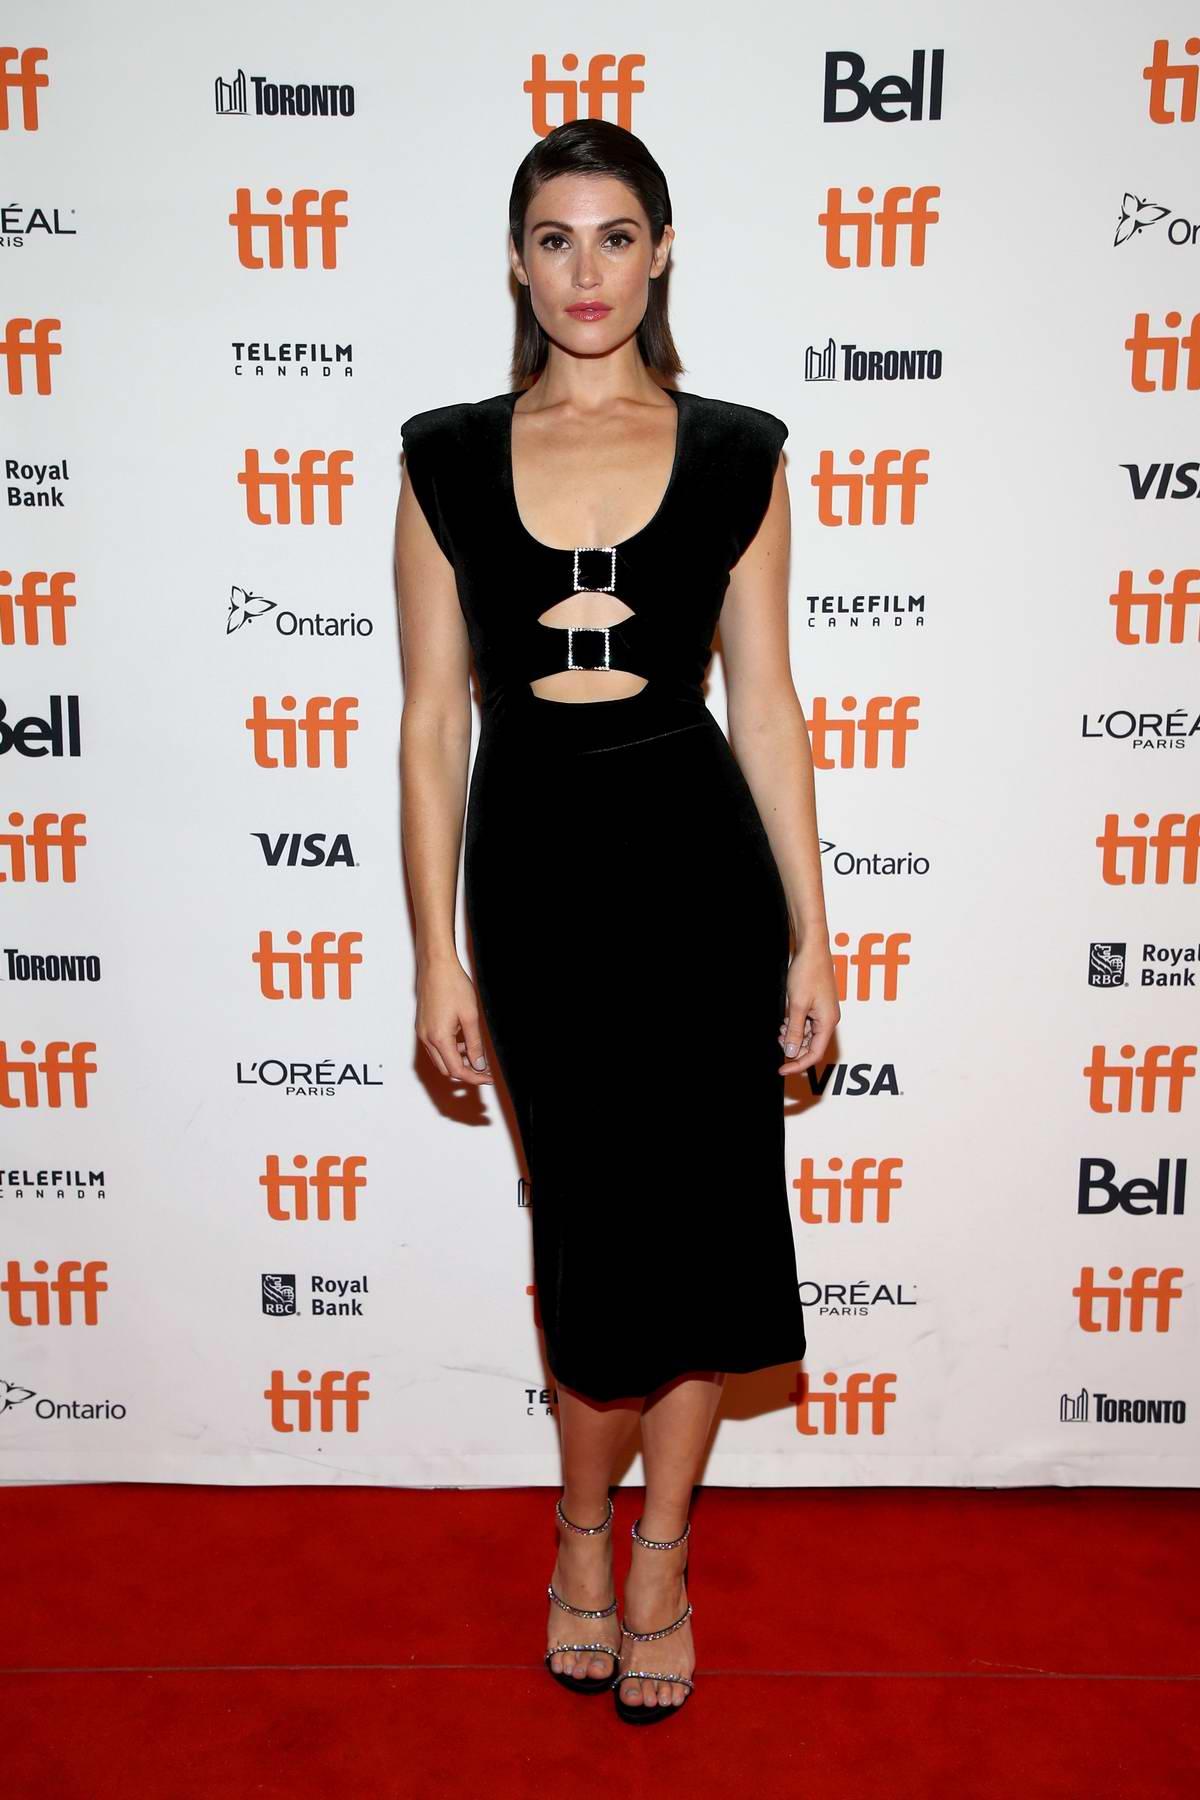 Gemma Arterton attends 'Vita & Virginia' Premiere during Toronto International Film Festival (TIFF 2018) in Toronto, Canada